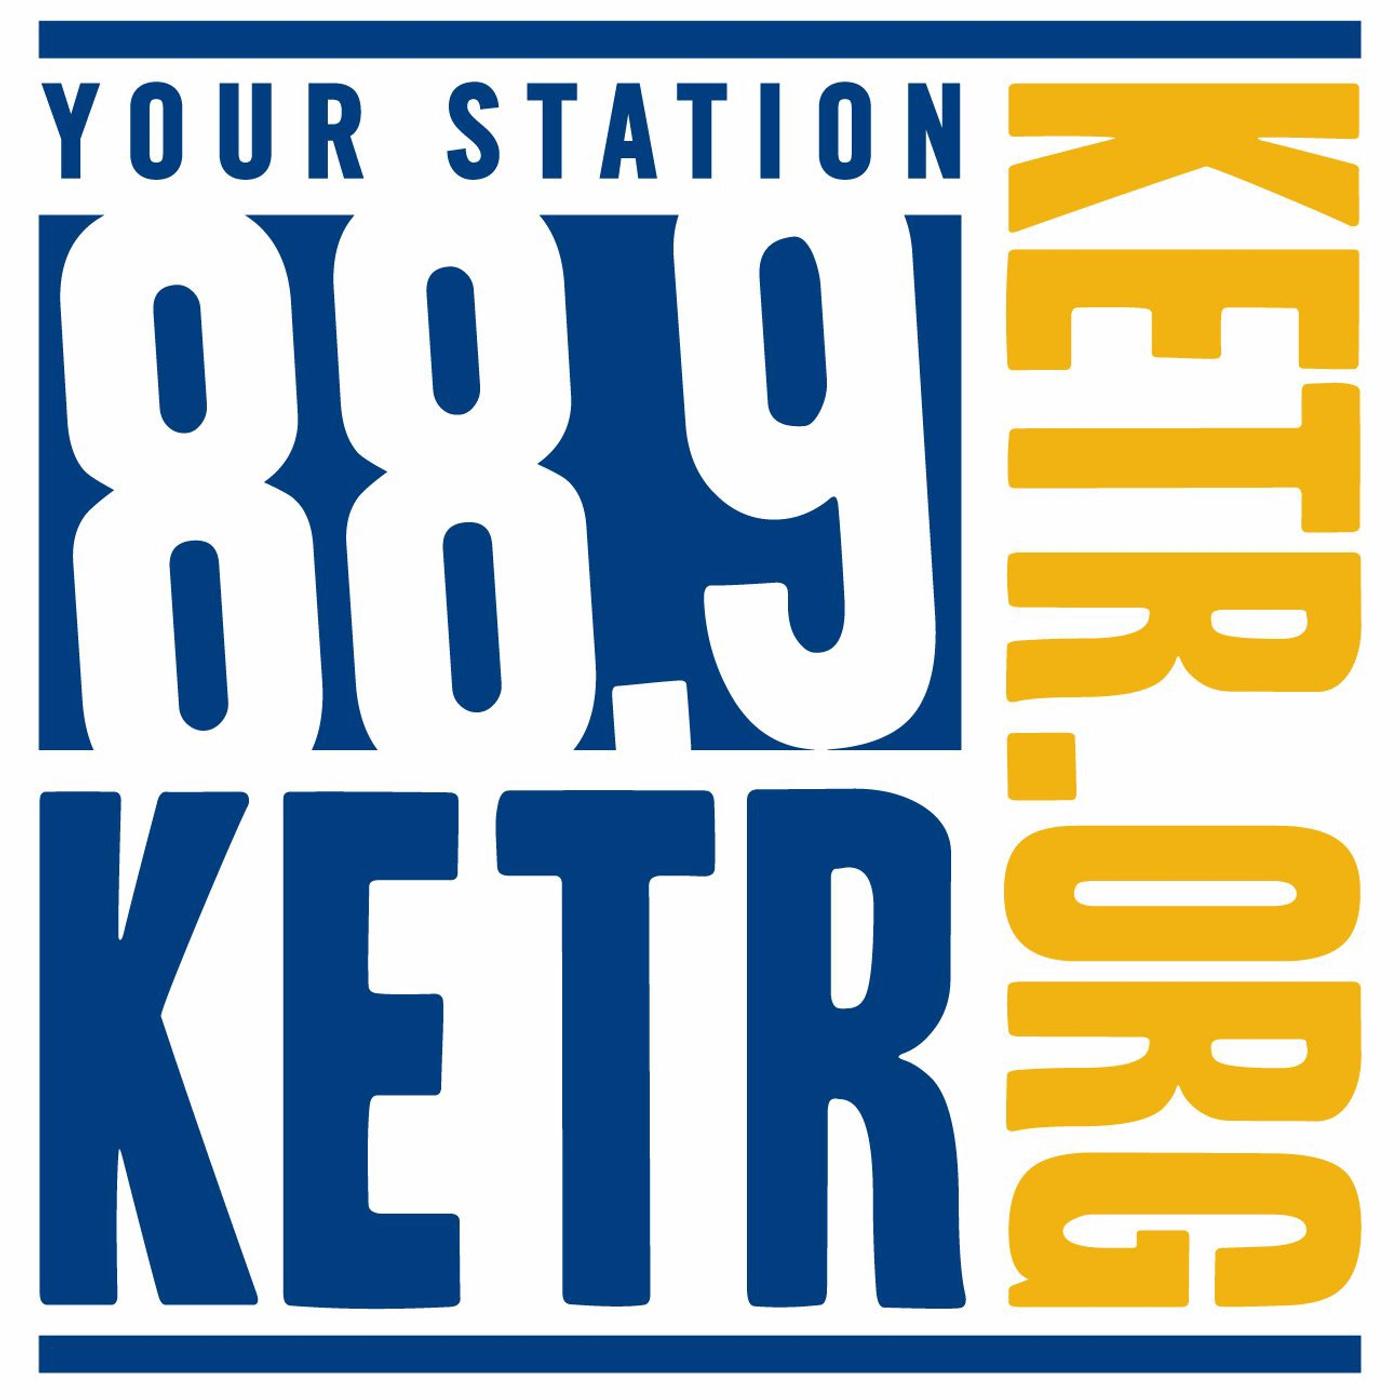 Buried Radio: KETR News Spot 02 - Jan. 22, 2019